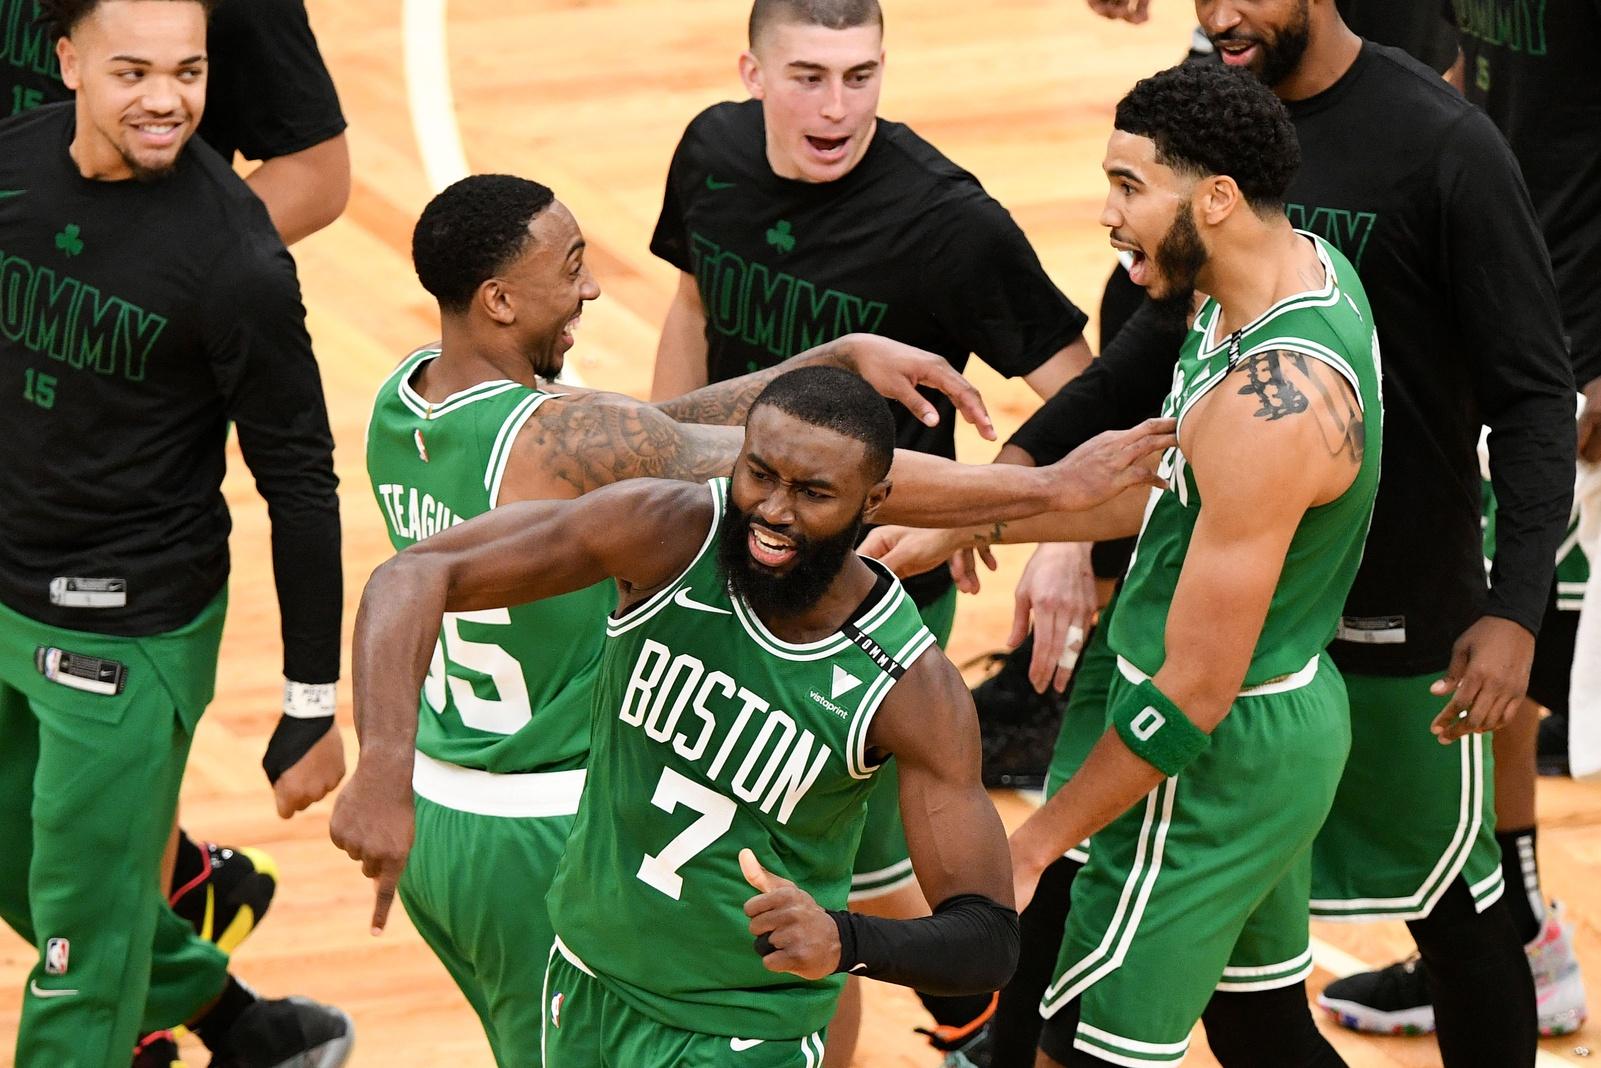 Rapid Recap: Giannis chokes, Tatum hits prayer as Celtics WIN